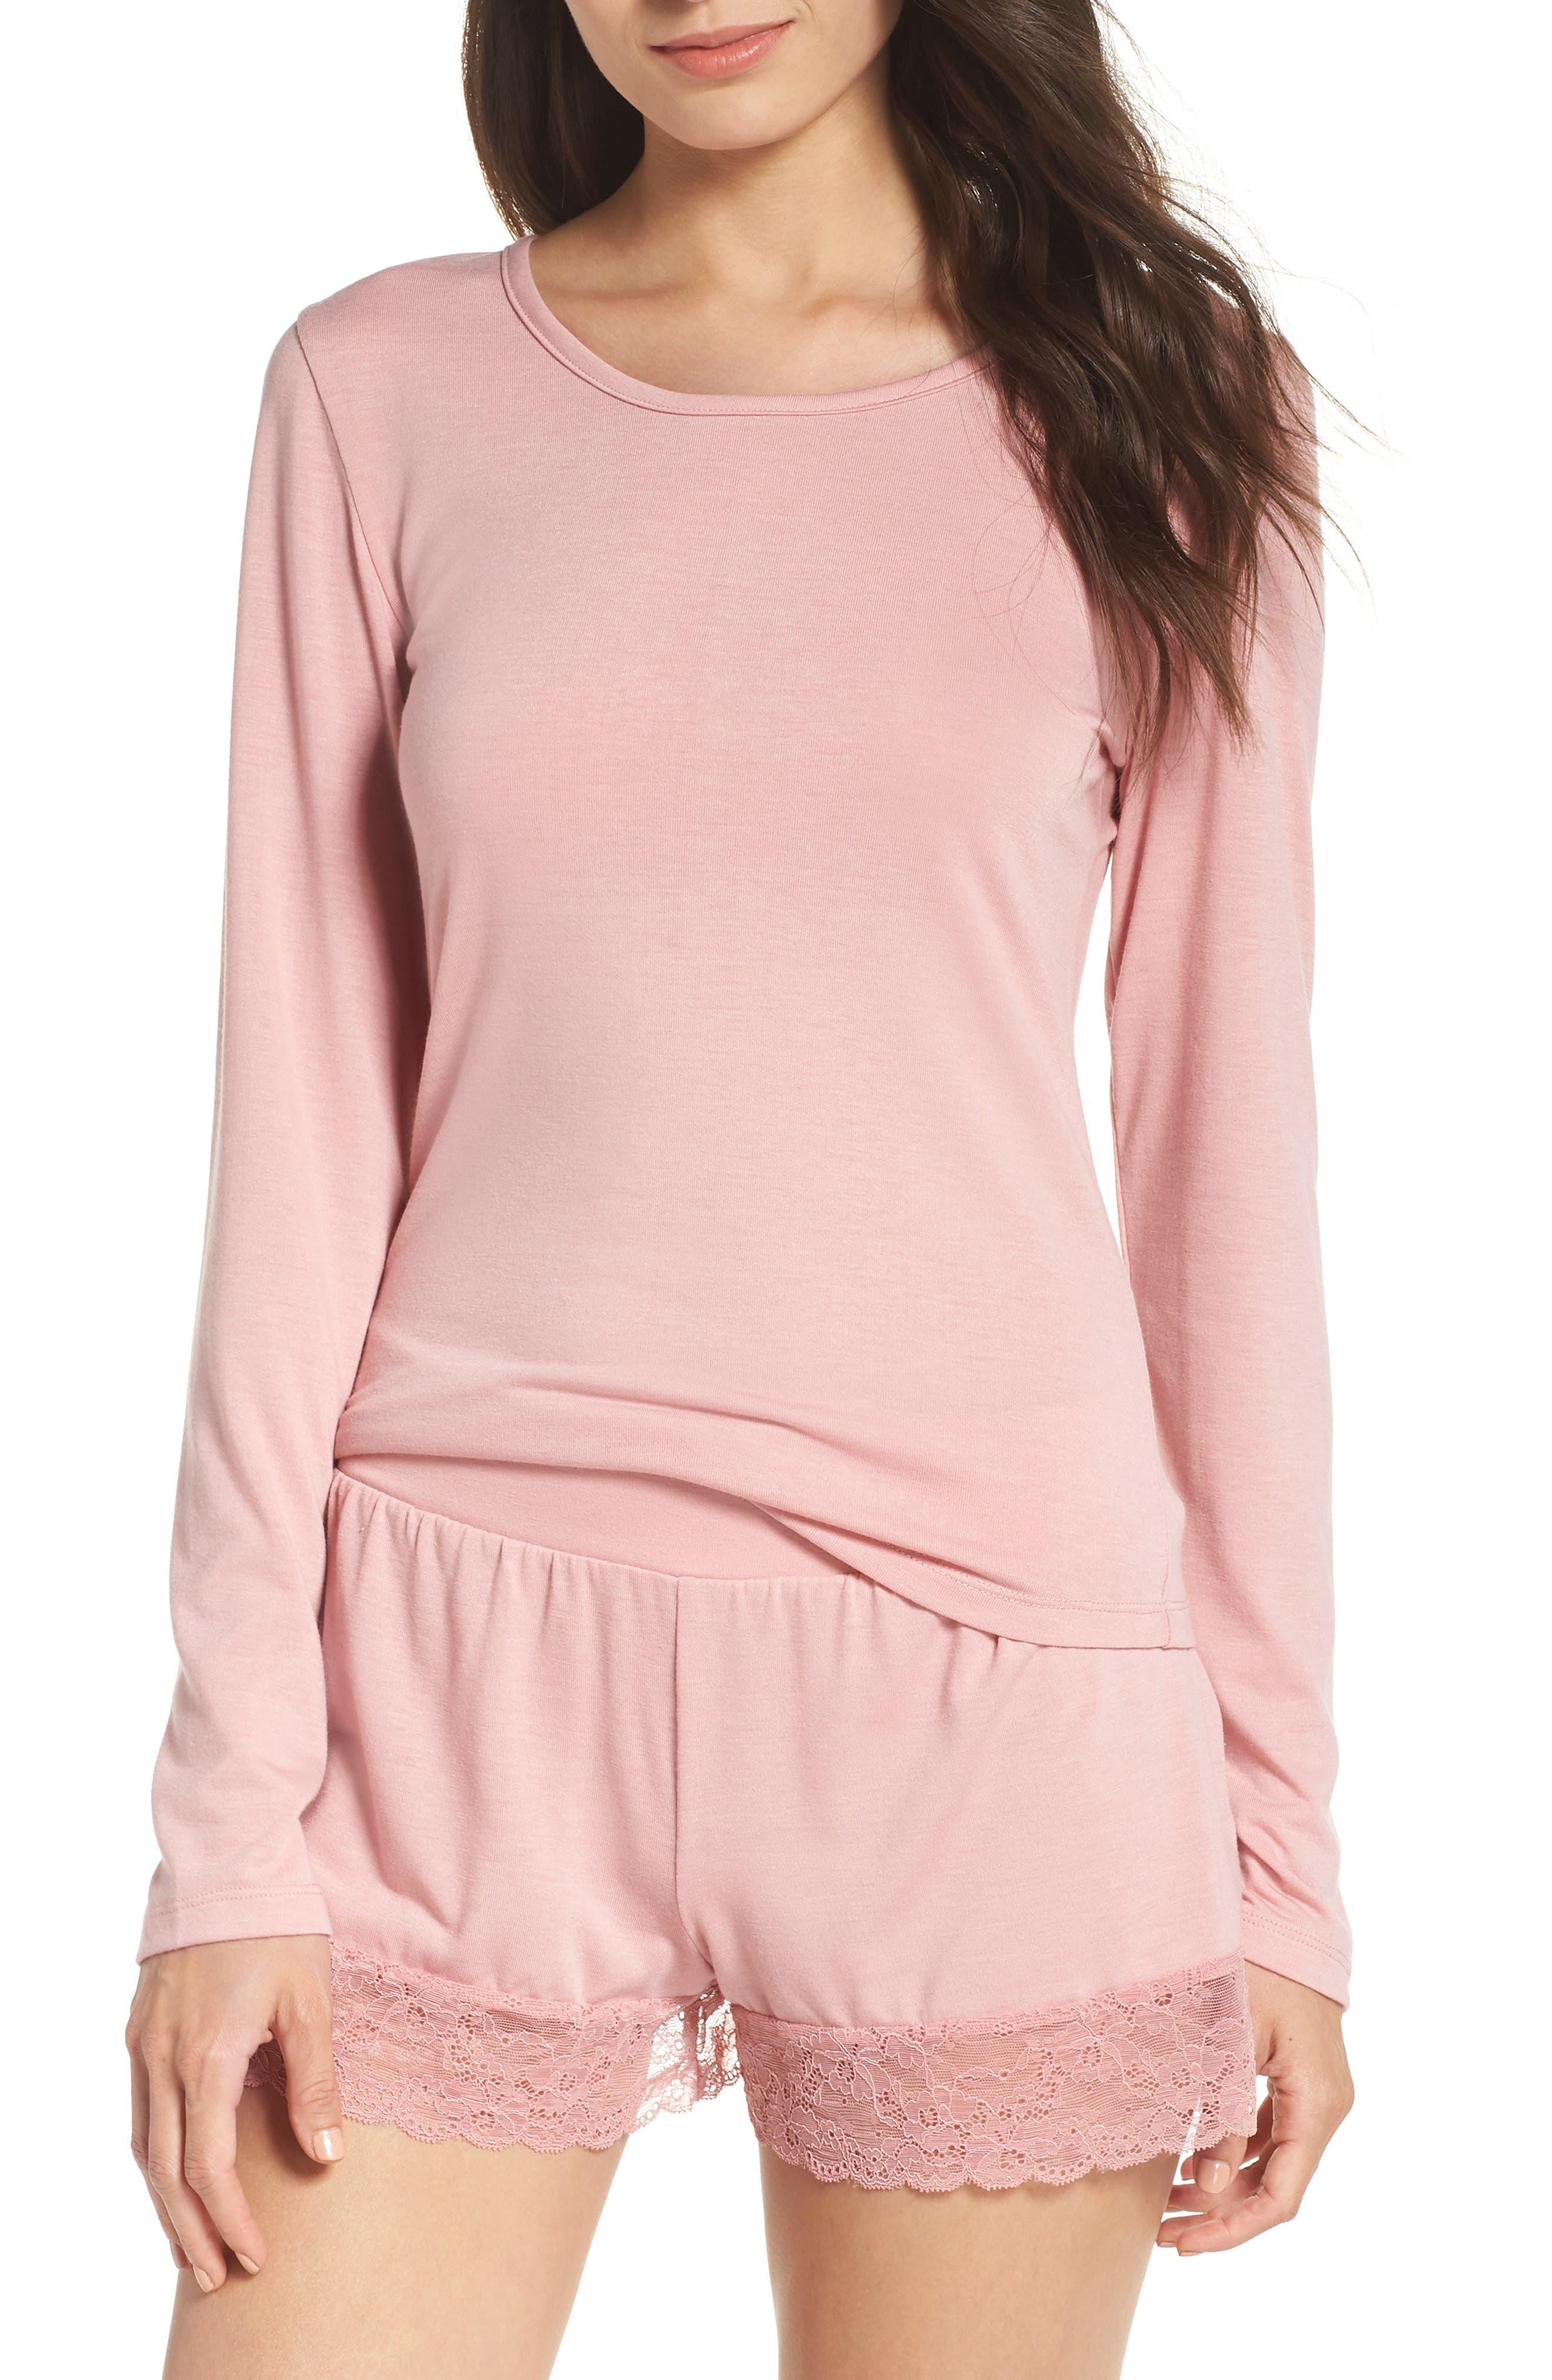 Honeydew Intimates Sheer Luck Pajamas, Pink